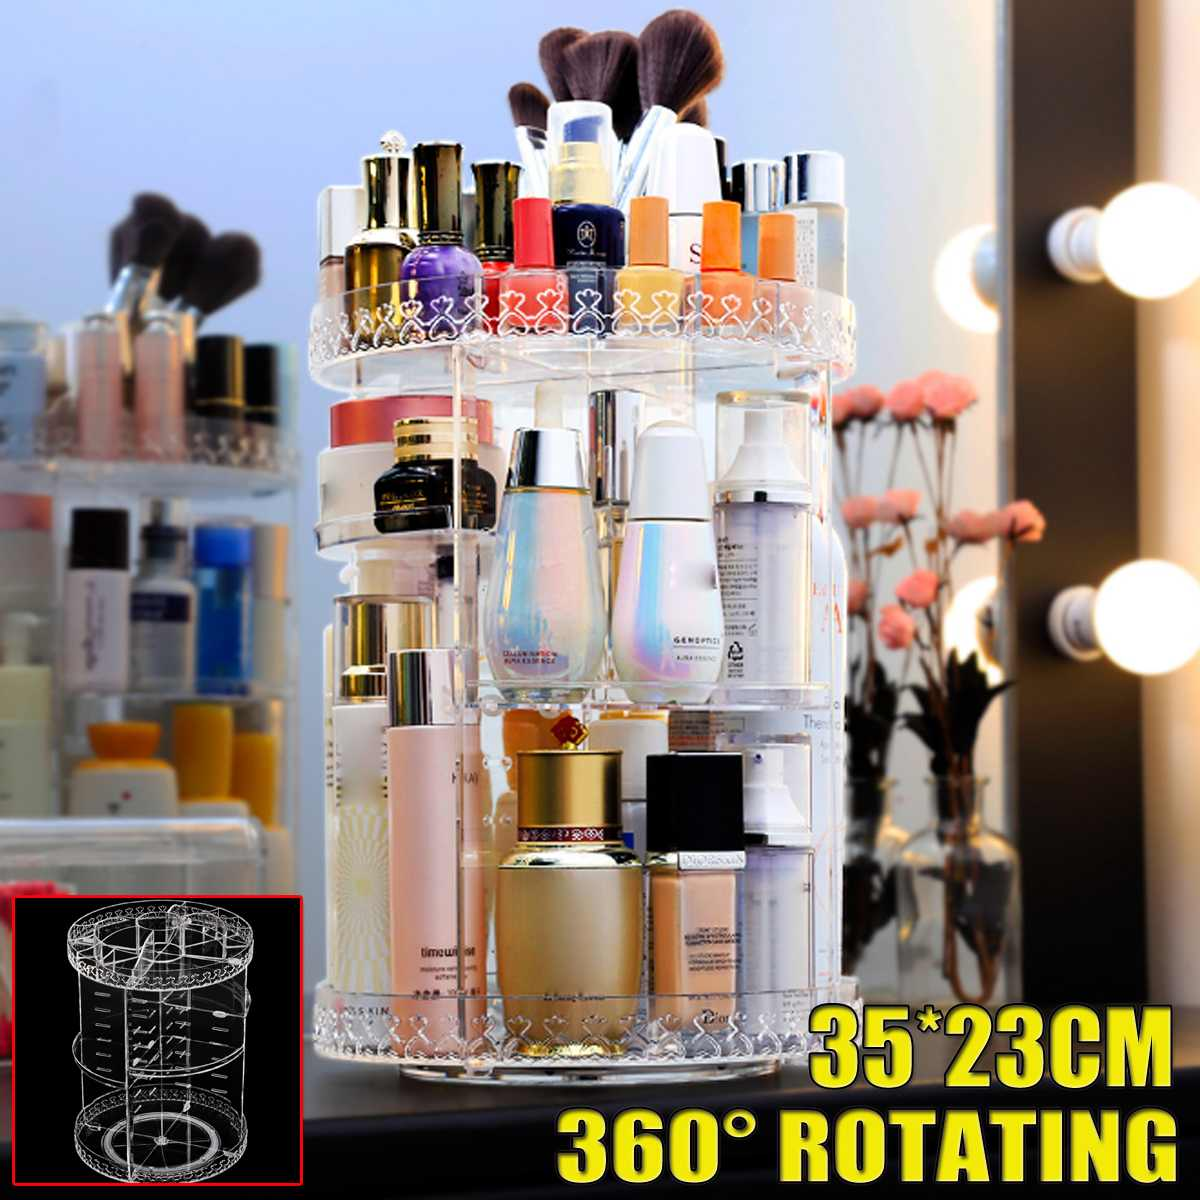 360 Degree Rotation Transparent Acrylic Cosmetics Storage Box Fashion Spin Multi-function Detachable Makeup Beauty Organizer thumbnail